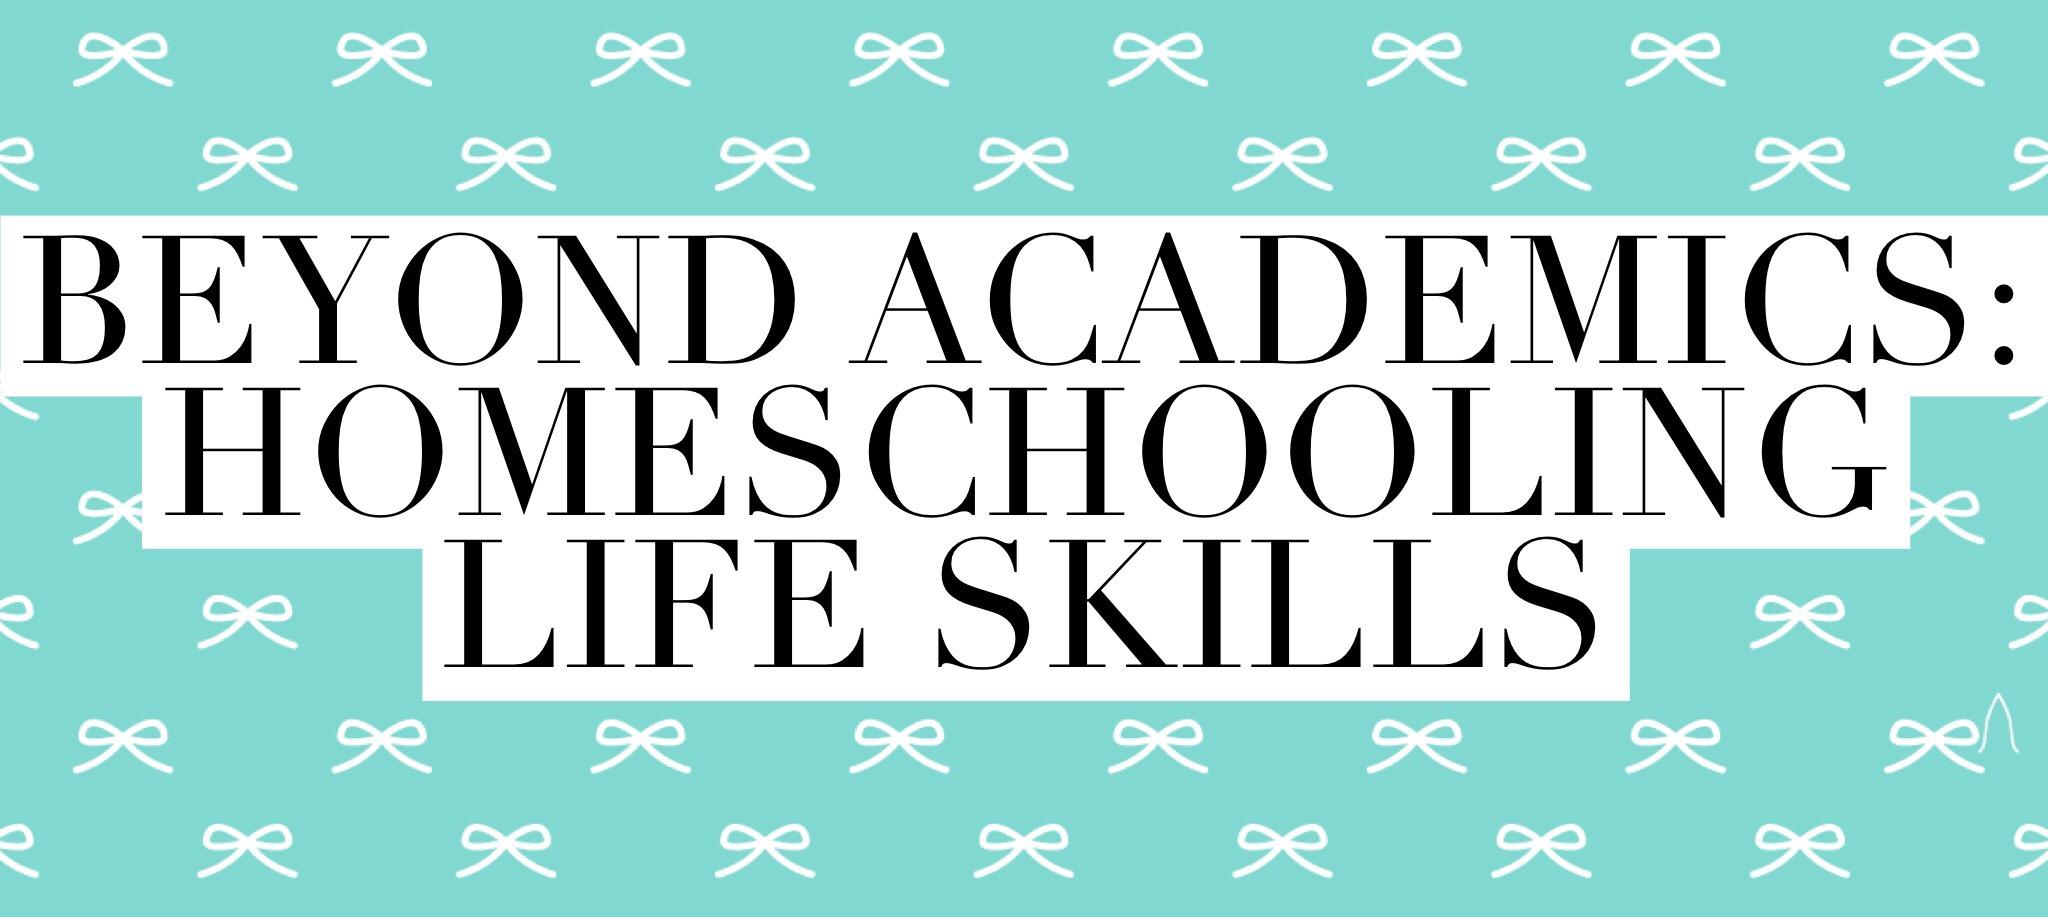 Beyond Academics: Homeschooling Life Skills